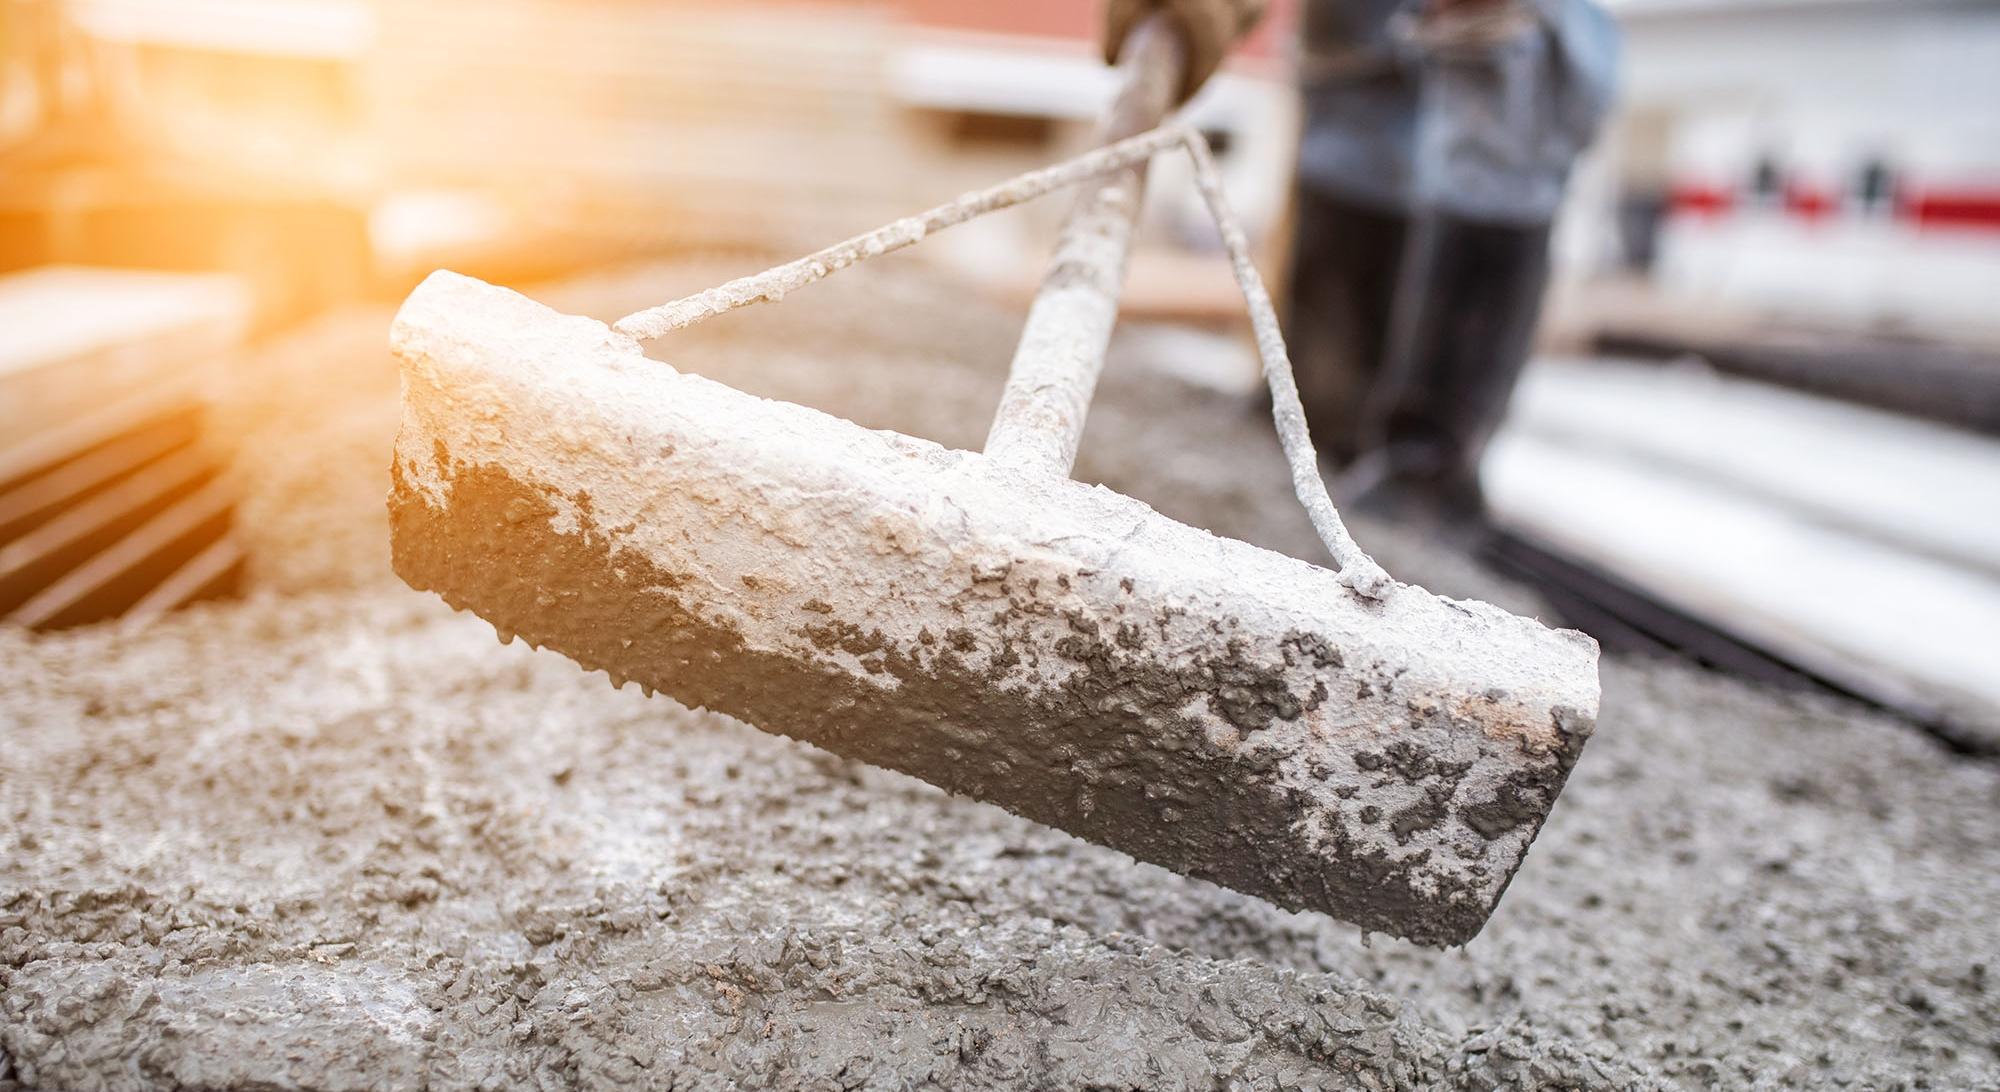 stock-photo-leveling-concrete-with-trowels-laborer-spreading-poured-concrete-selective-focus-a-construction-560978905.jpeg